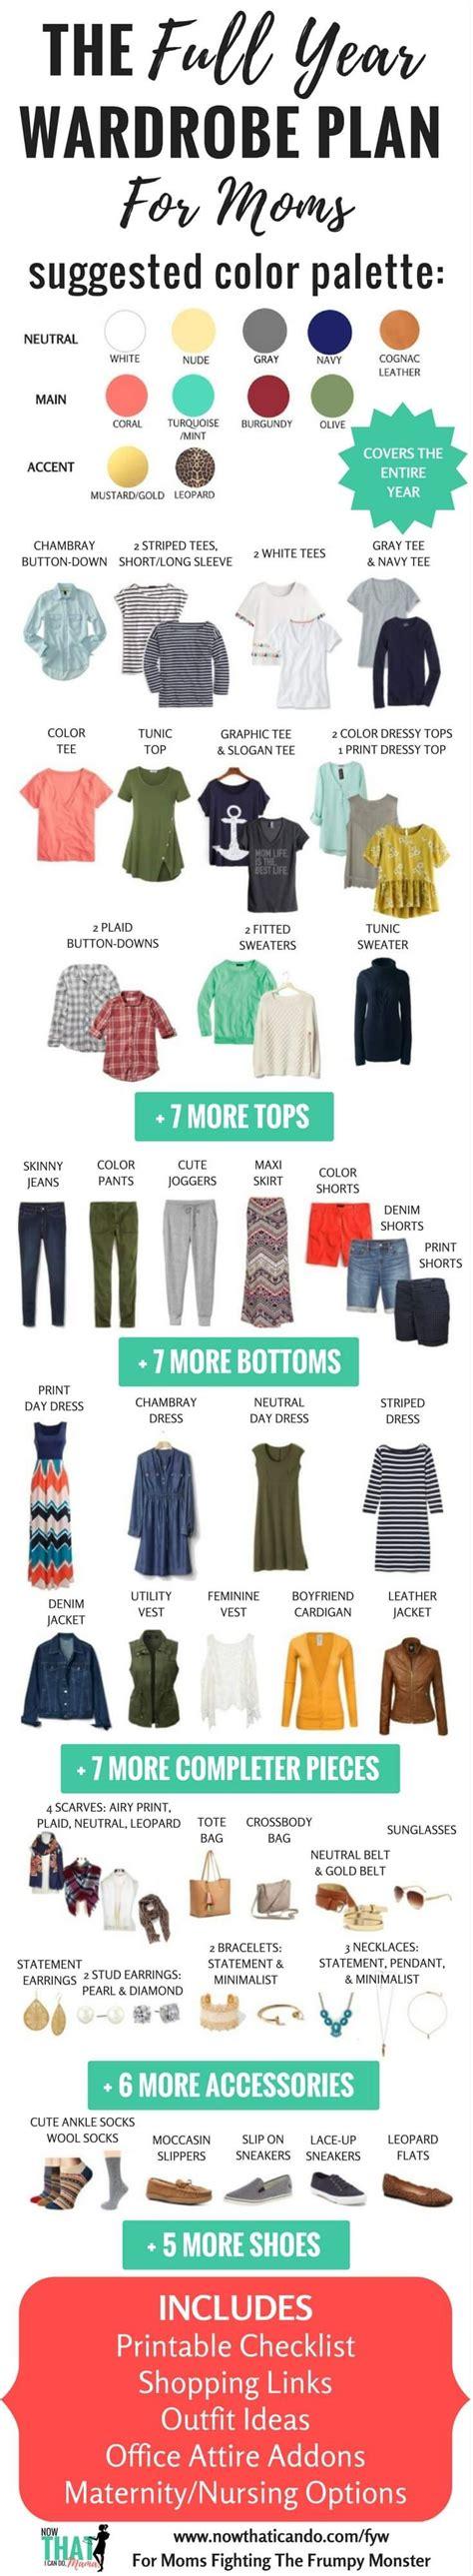 Capsule Wardrobe Planner by The 25 Best Capsule Clothing Ideas On